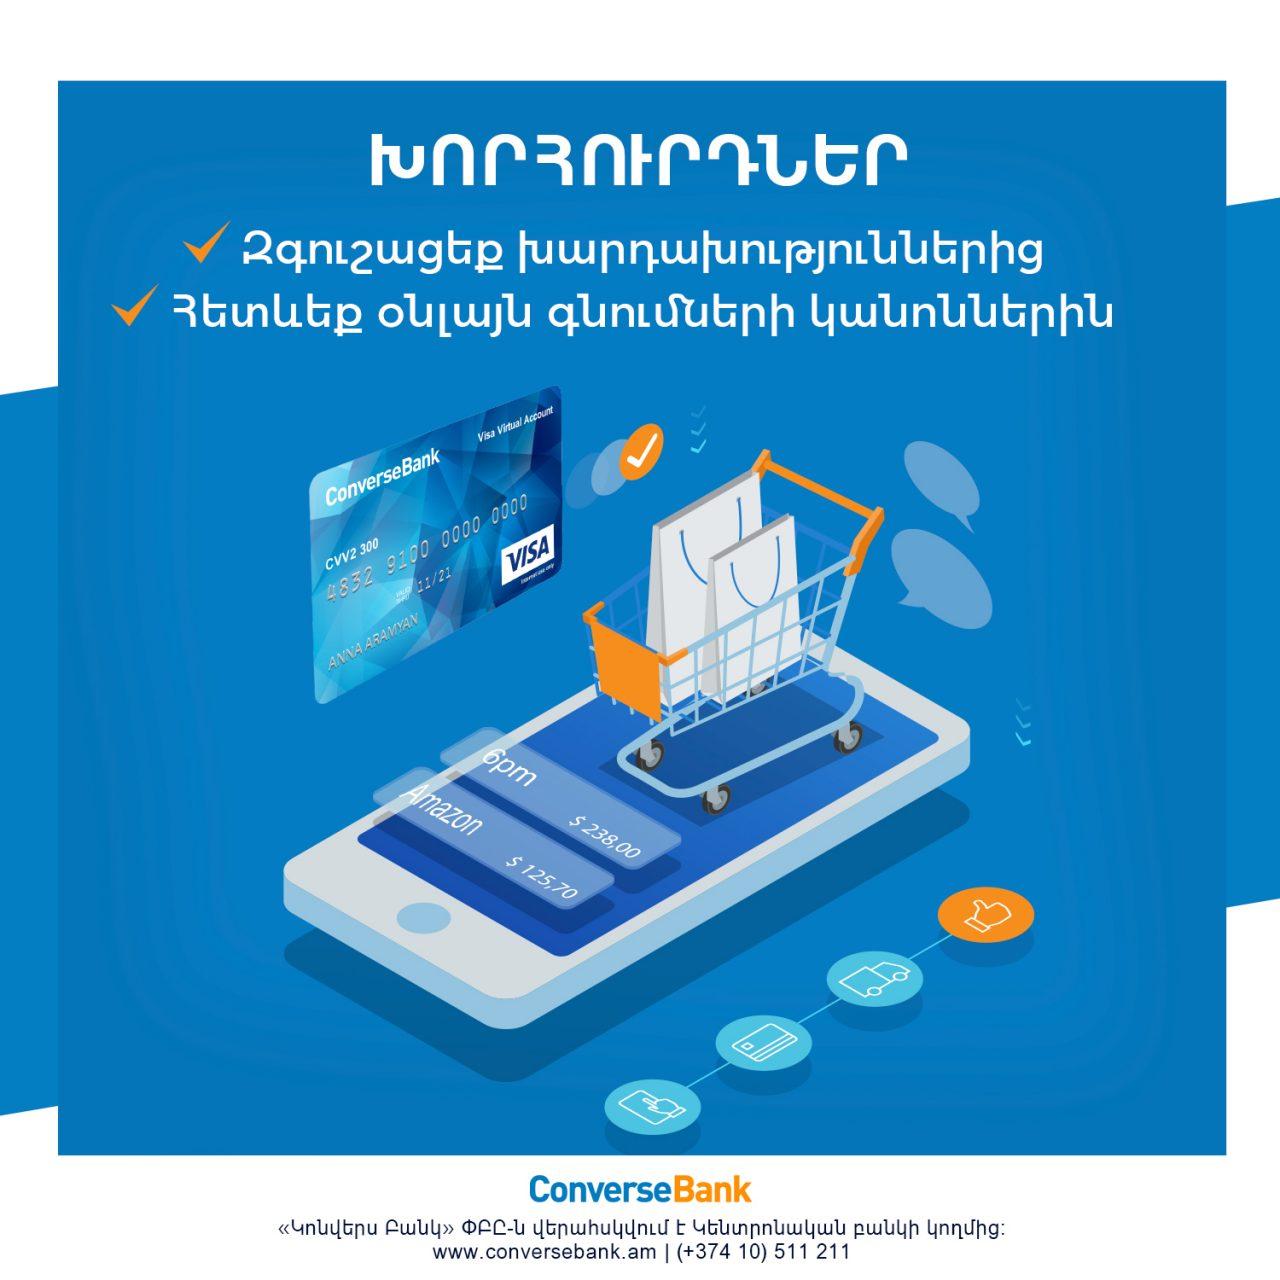 Safe online shopping. A few tips